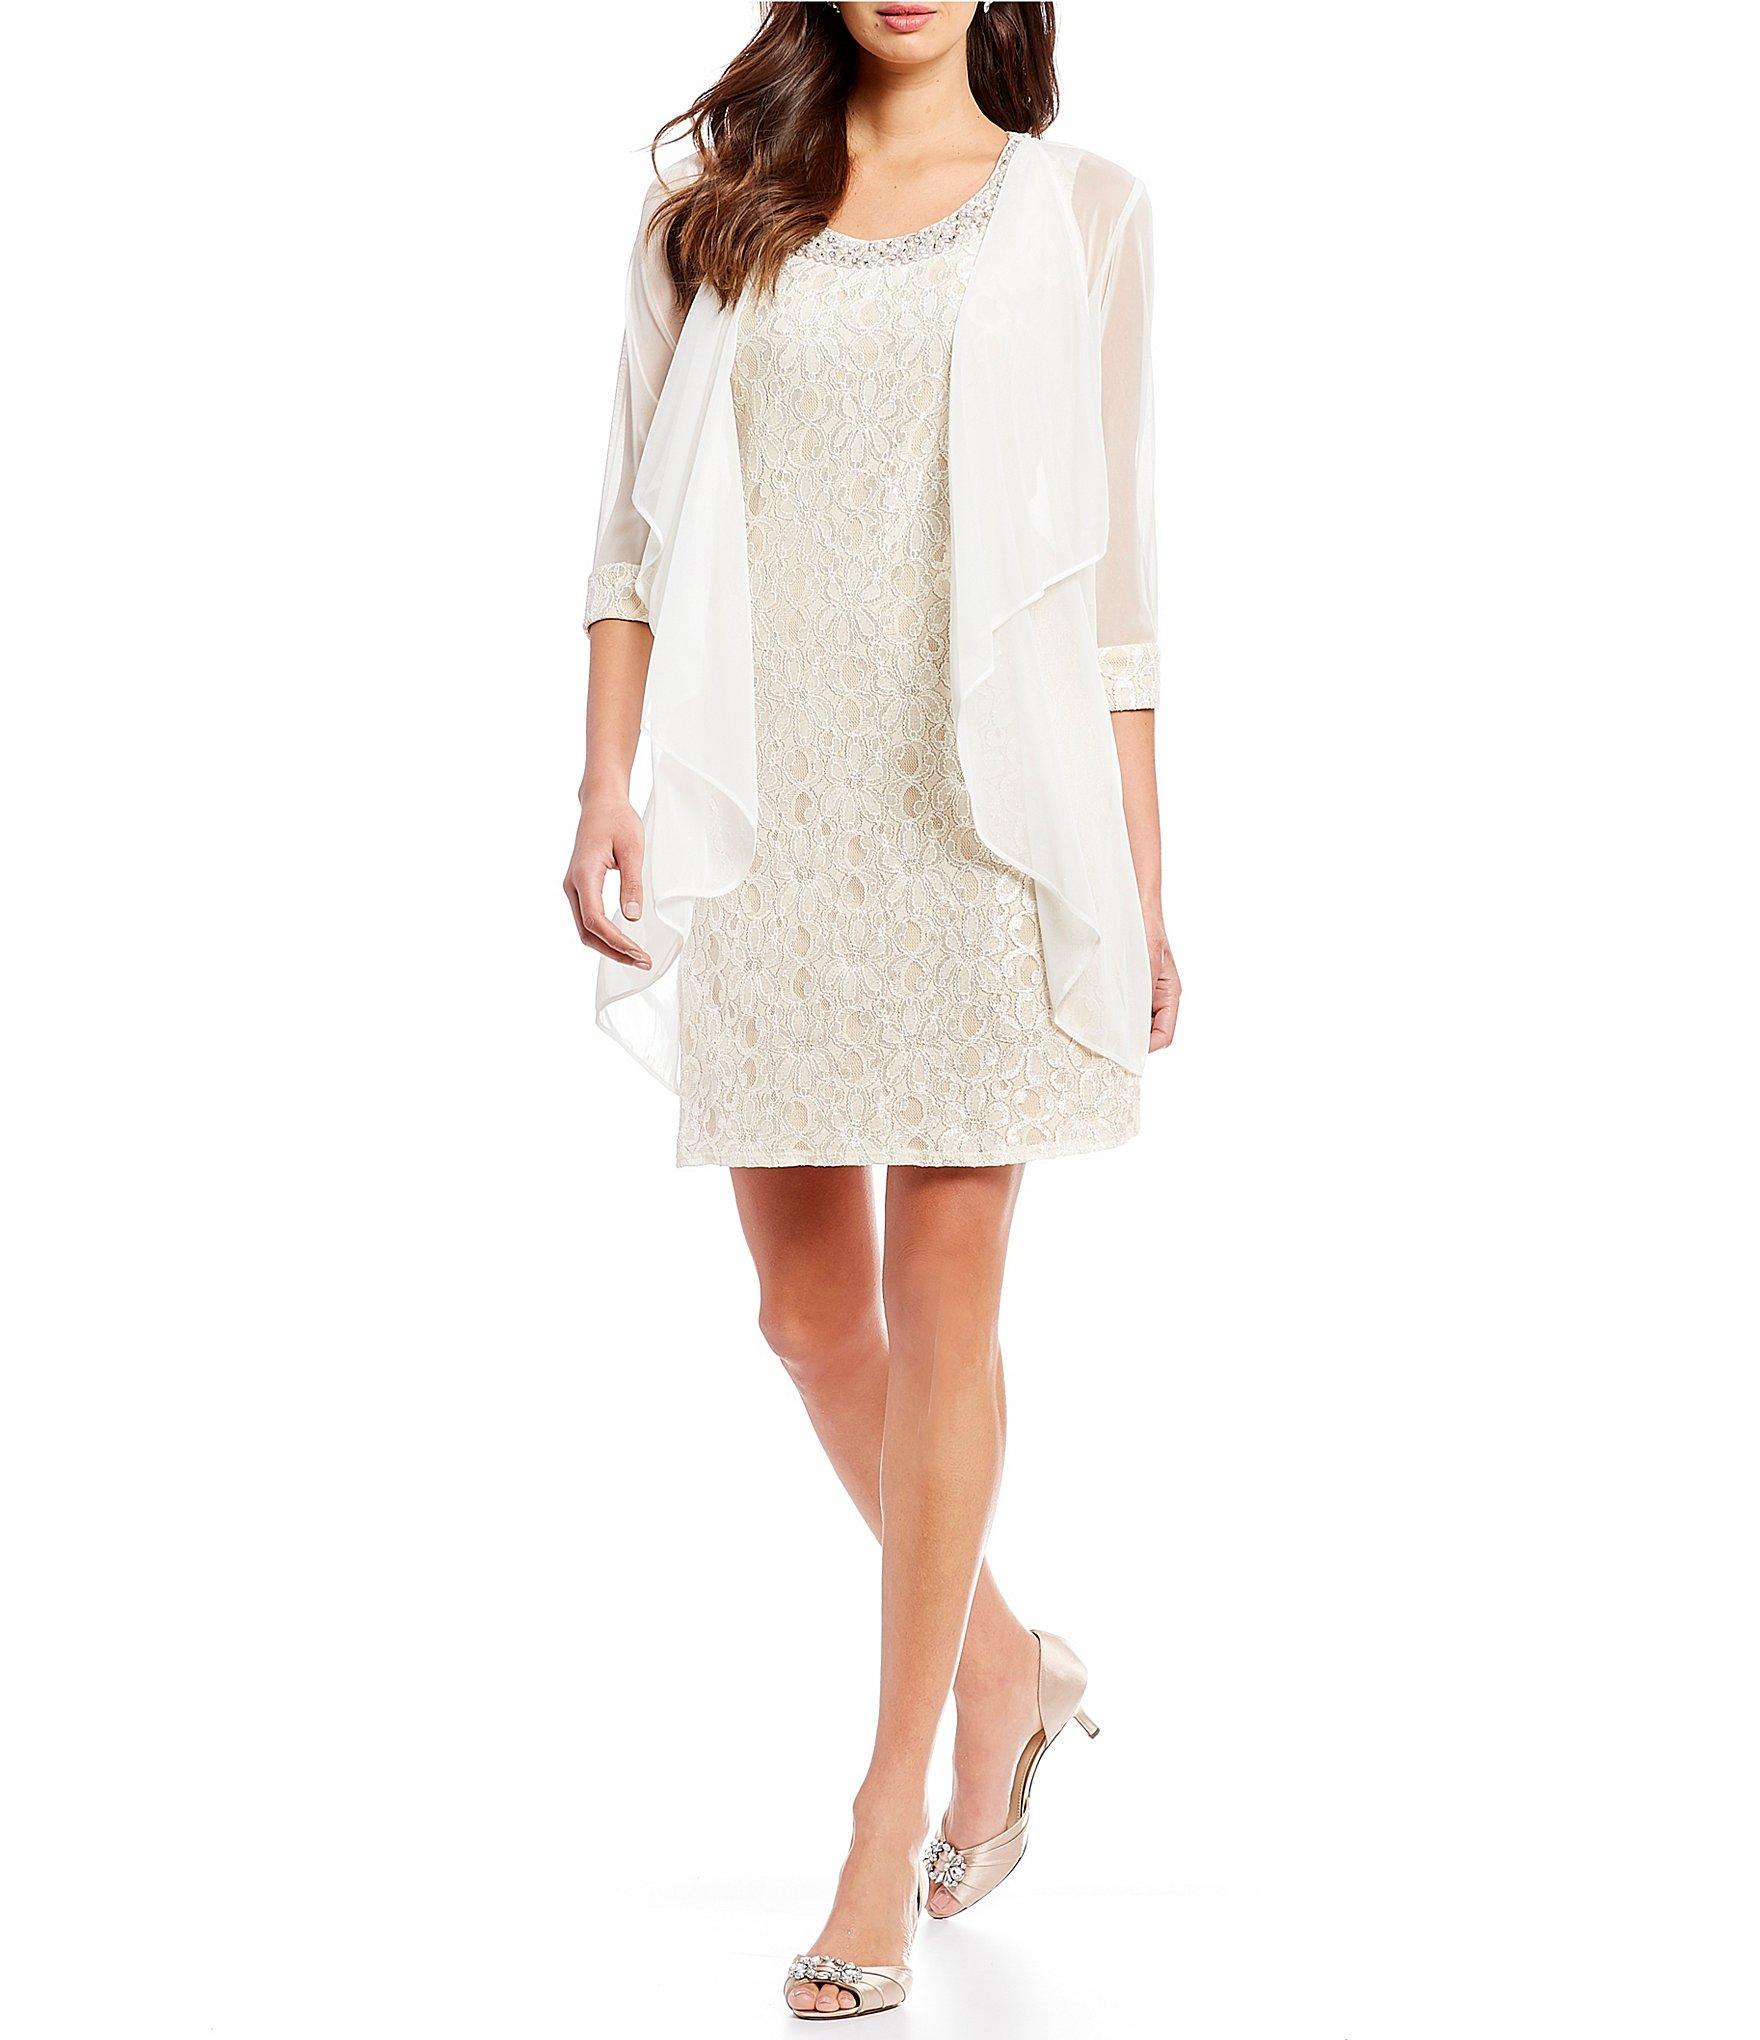 77a0c75edb4a1 R   M Richards. Women s Pink Petite Beaded-neck Lace 2-piece Glitter Jacket  Dress